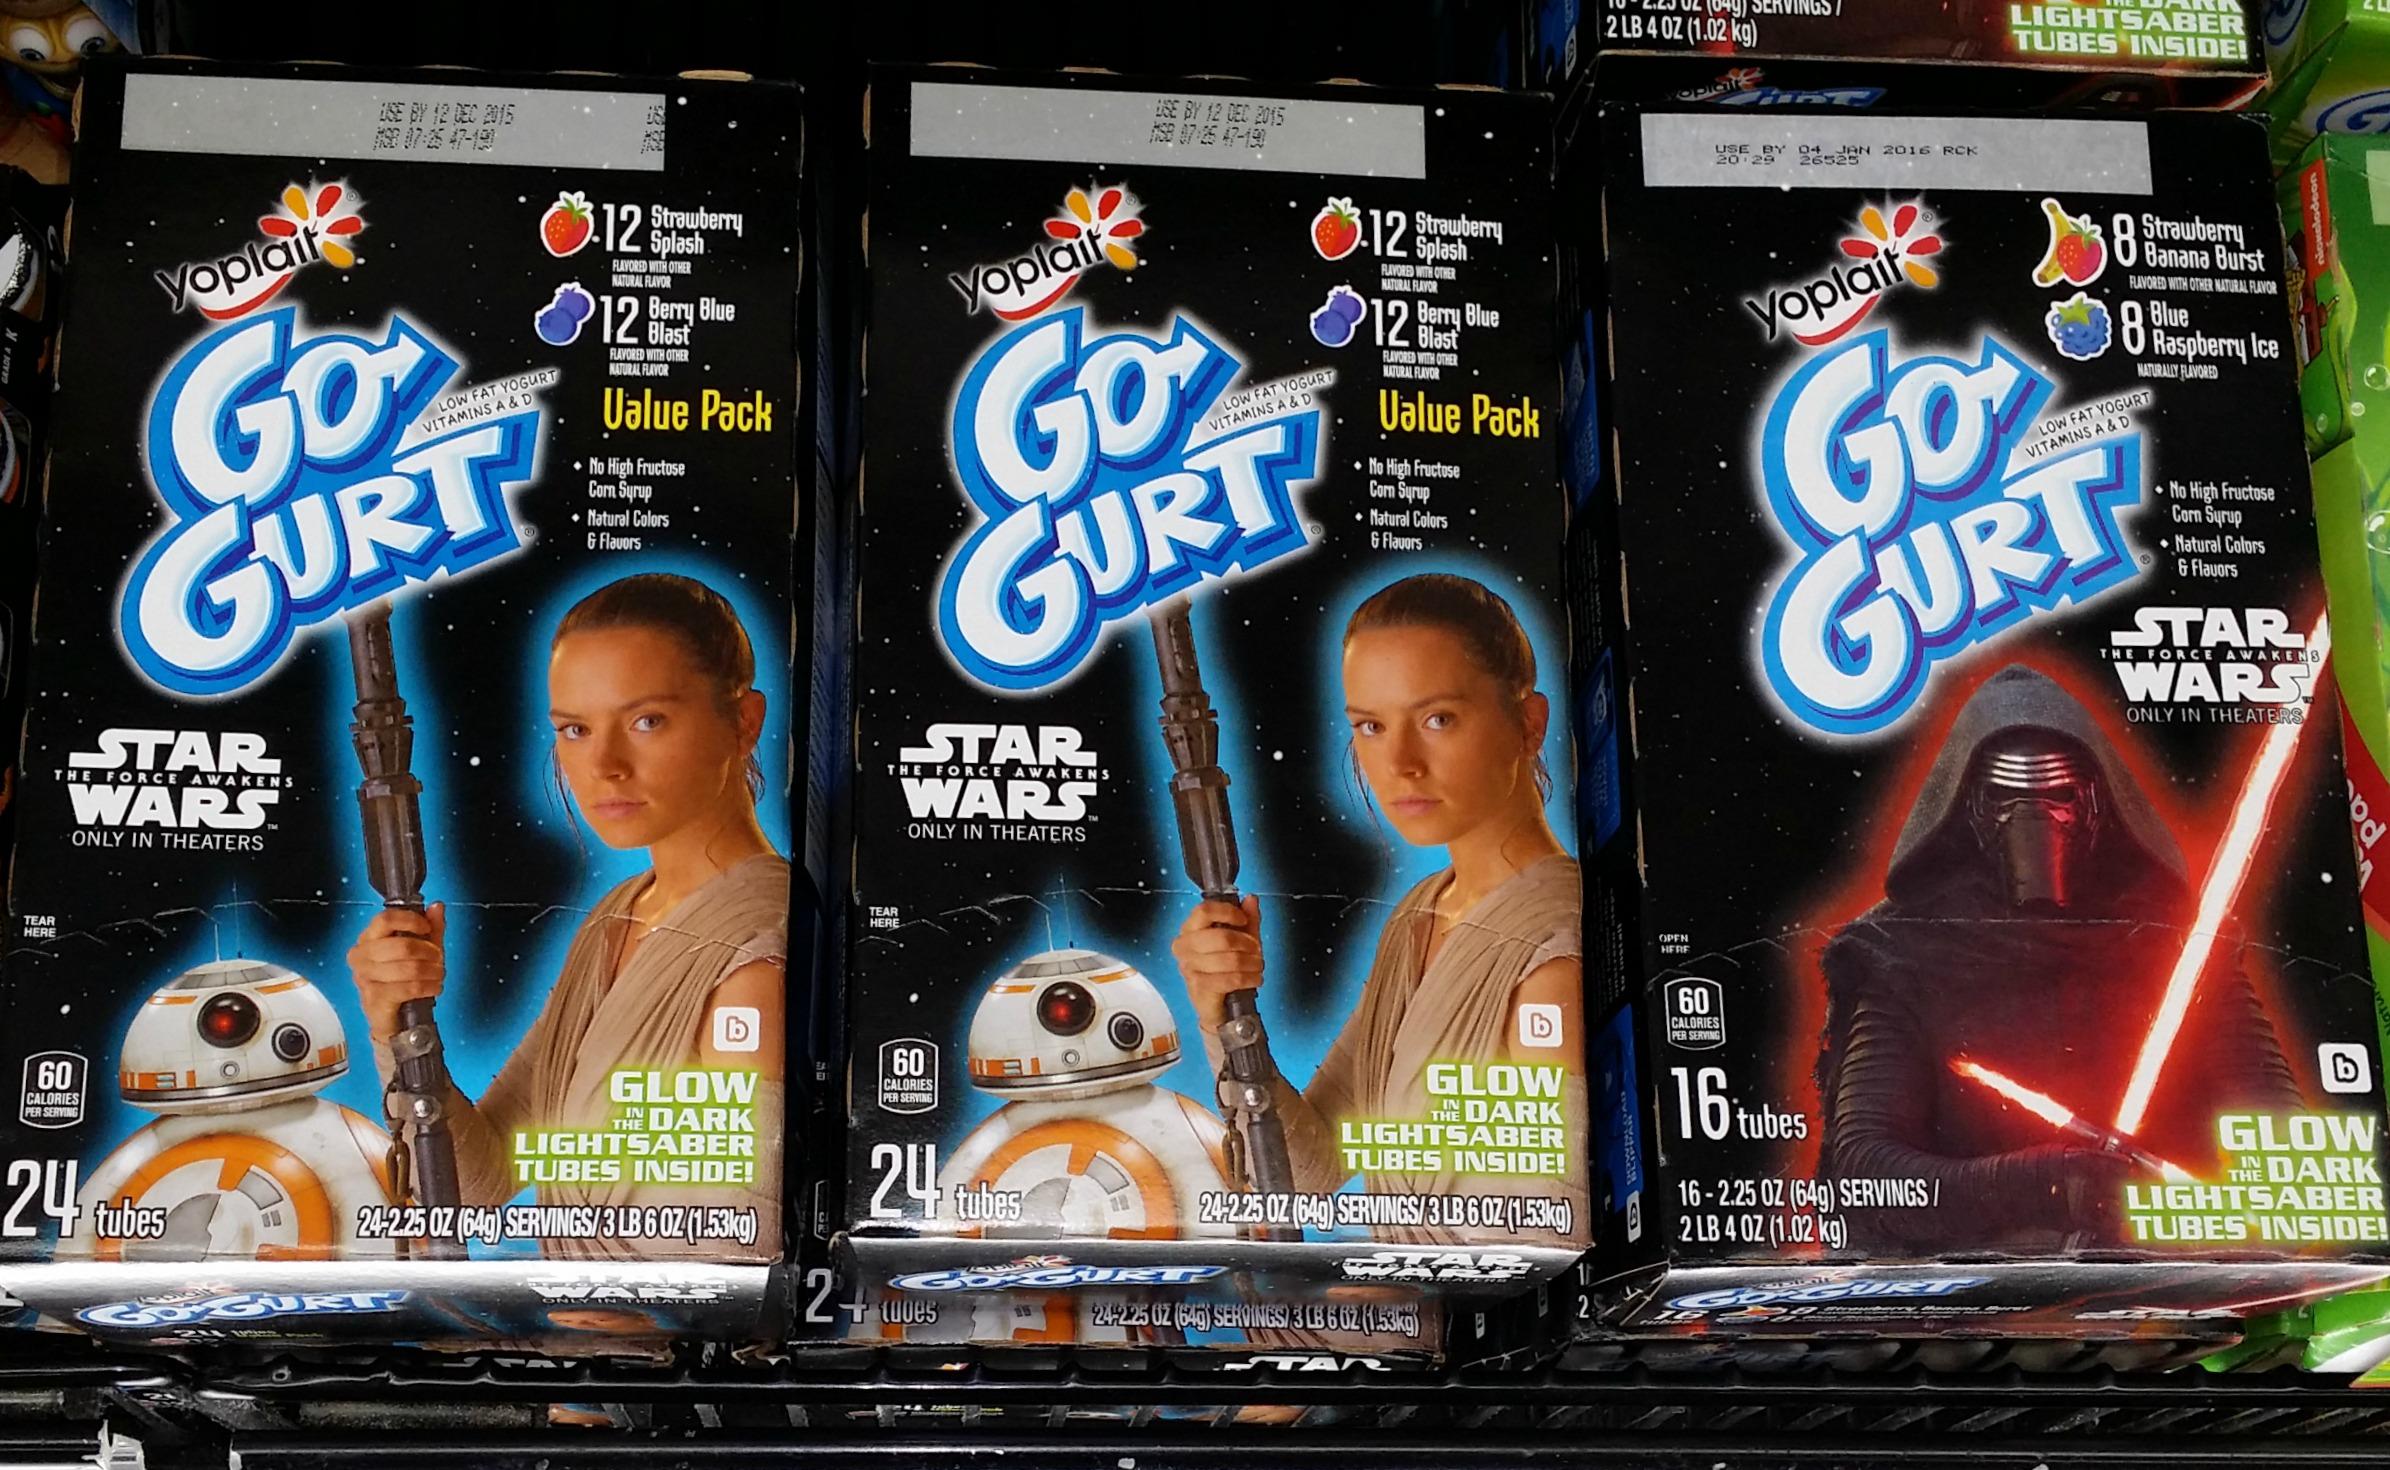 go-gurt star wars